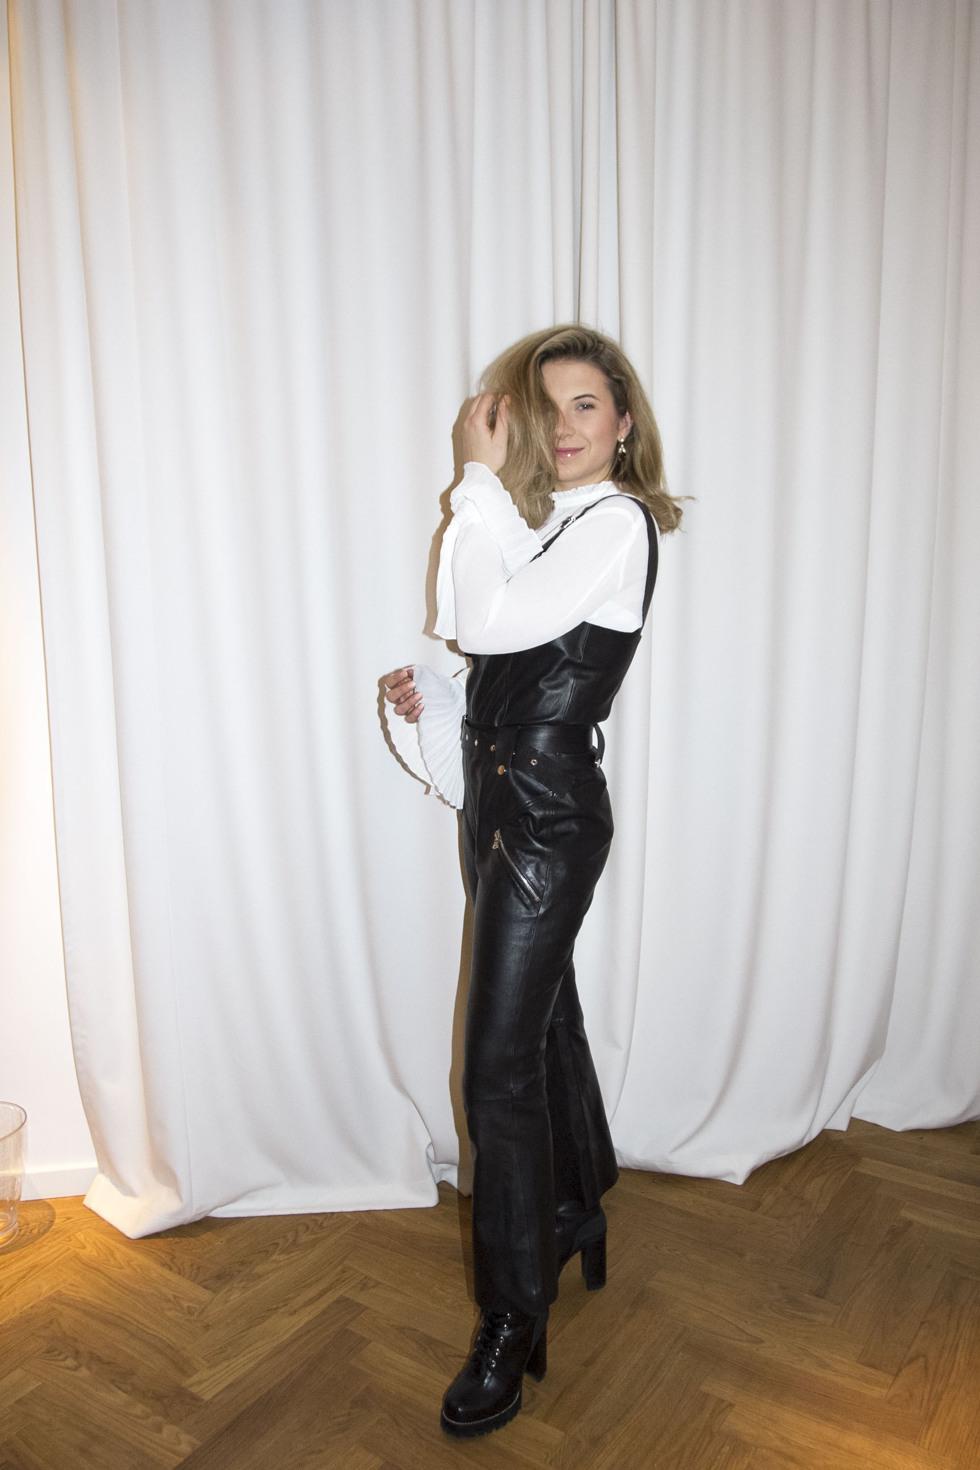 _henrietta_fromholtz_outfit_17